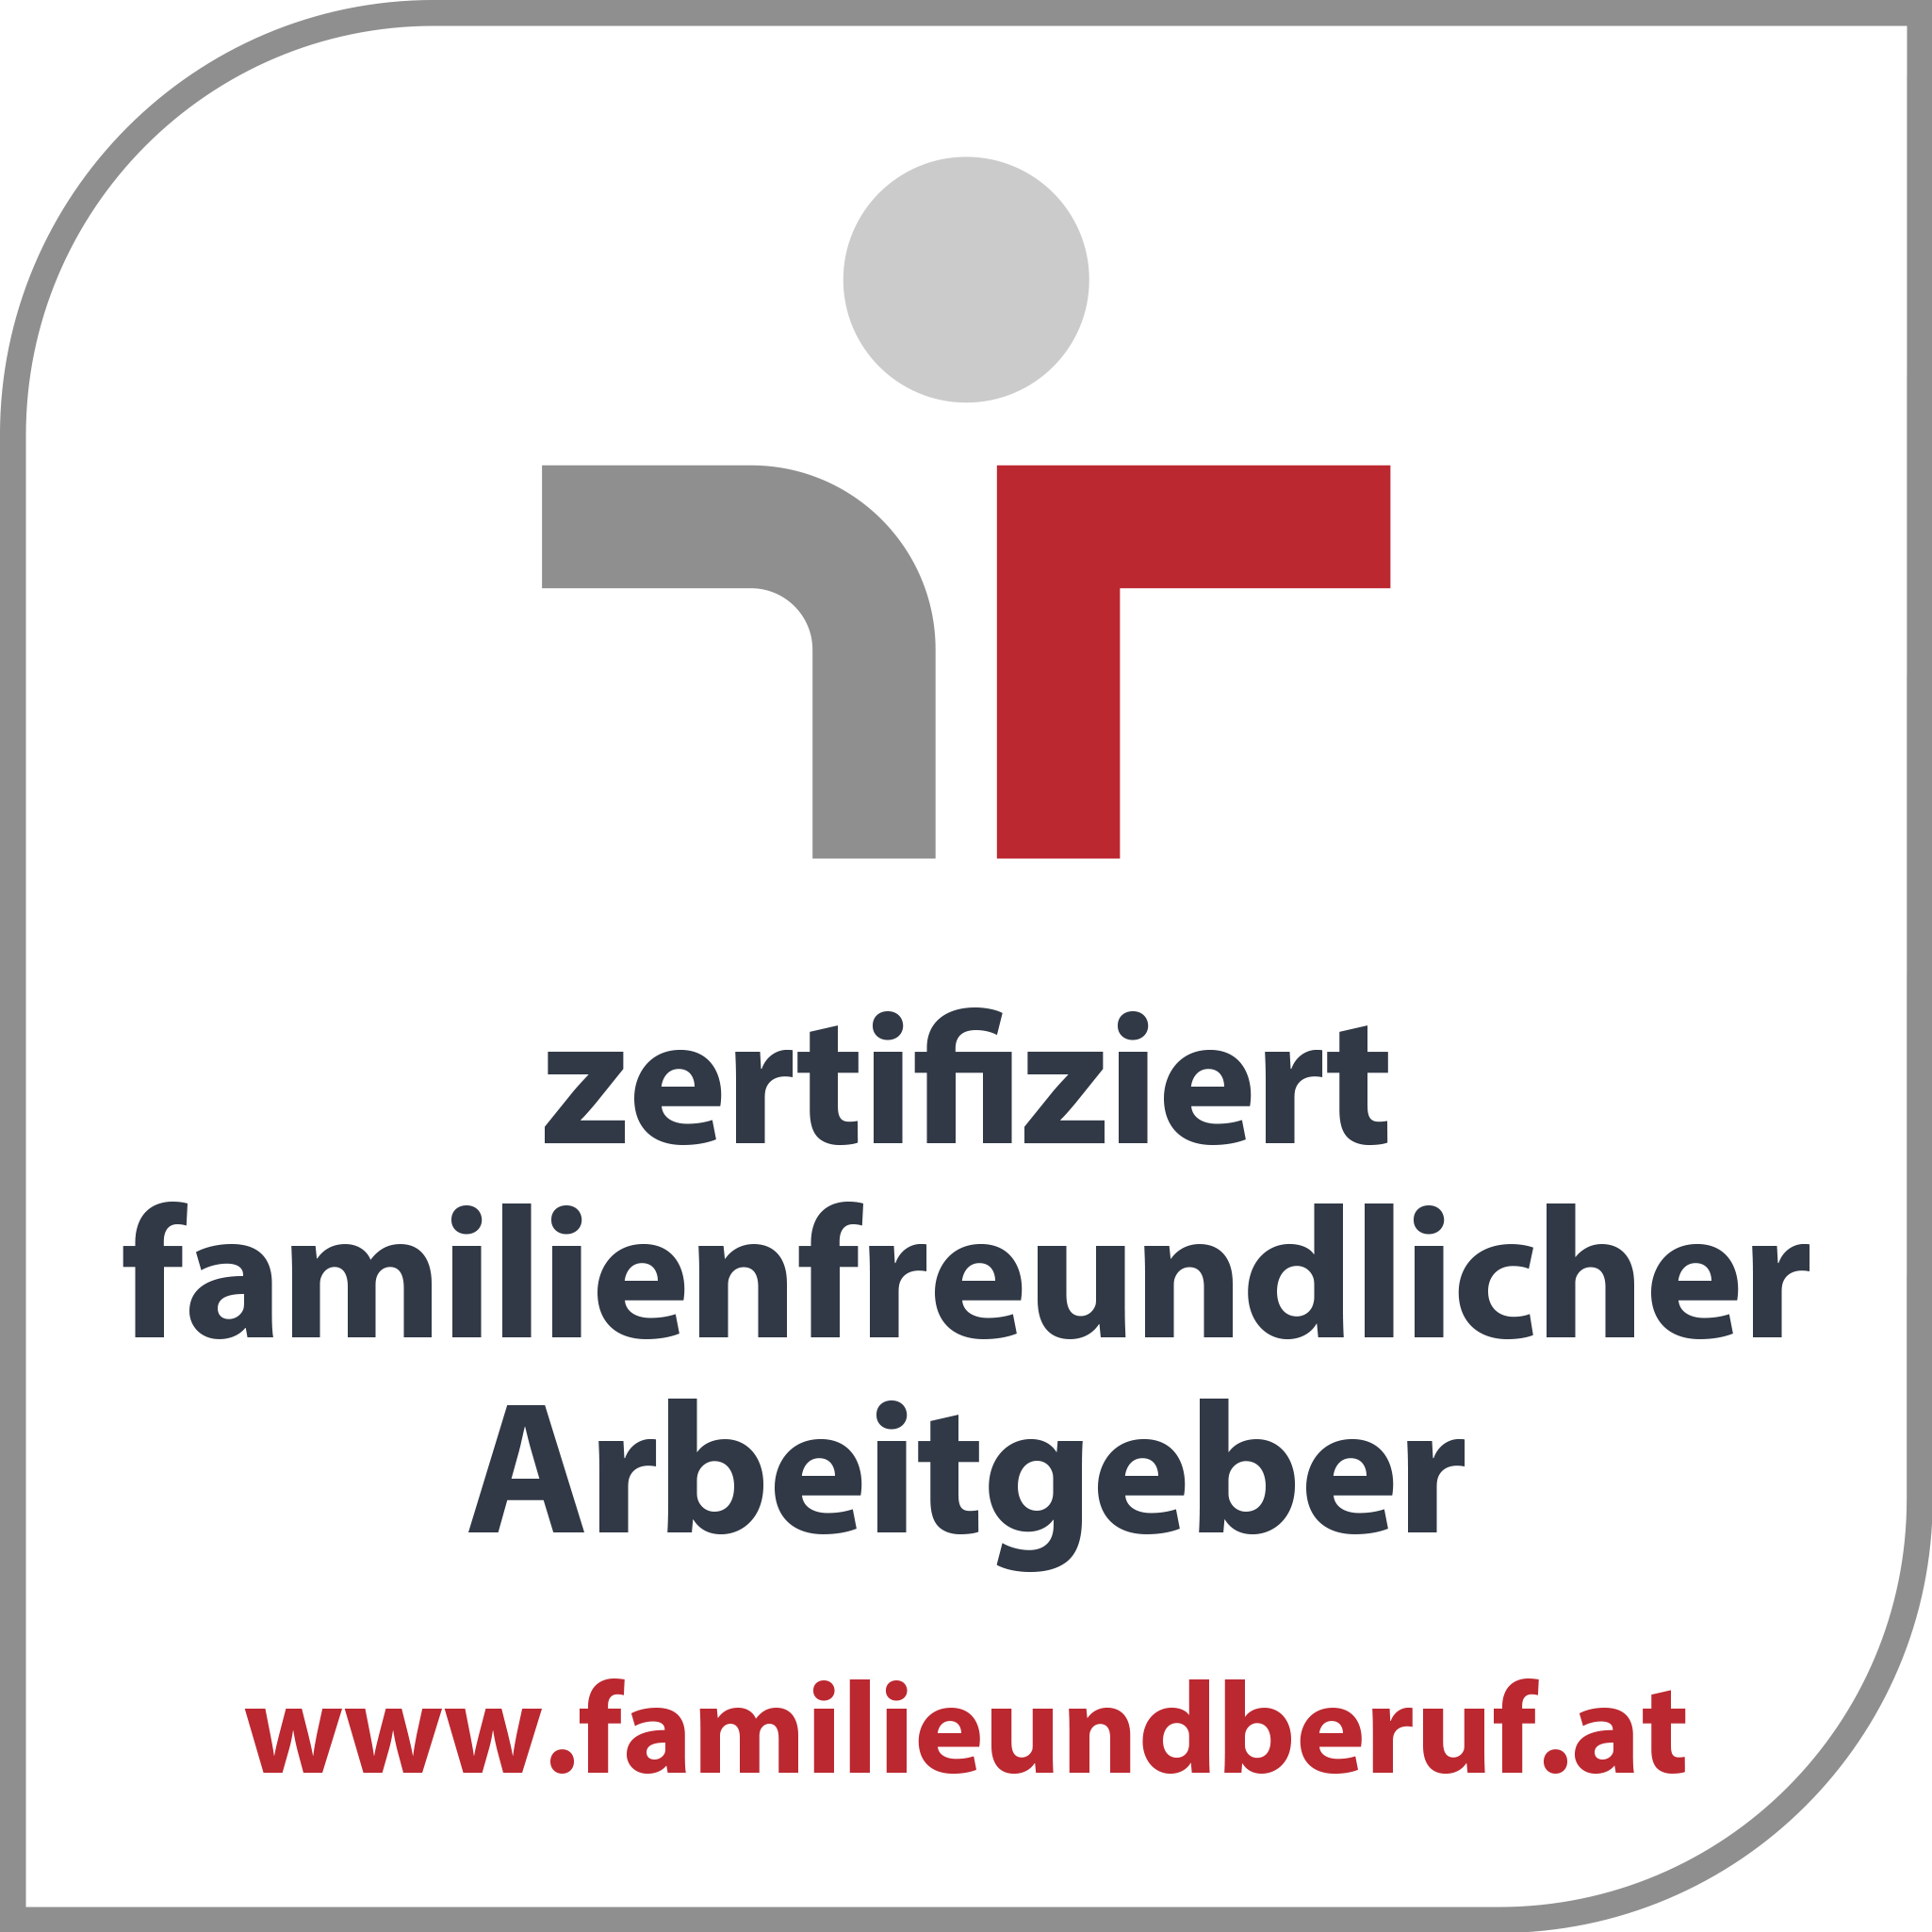 Familie & Beruf Siegel AT